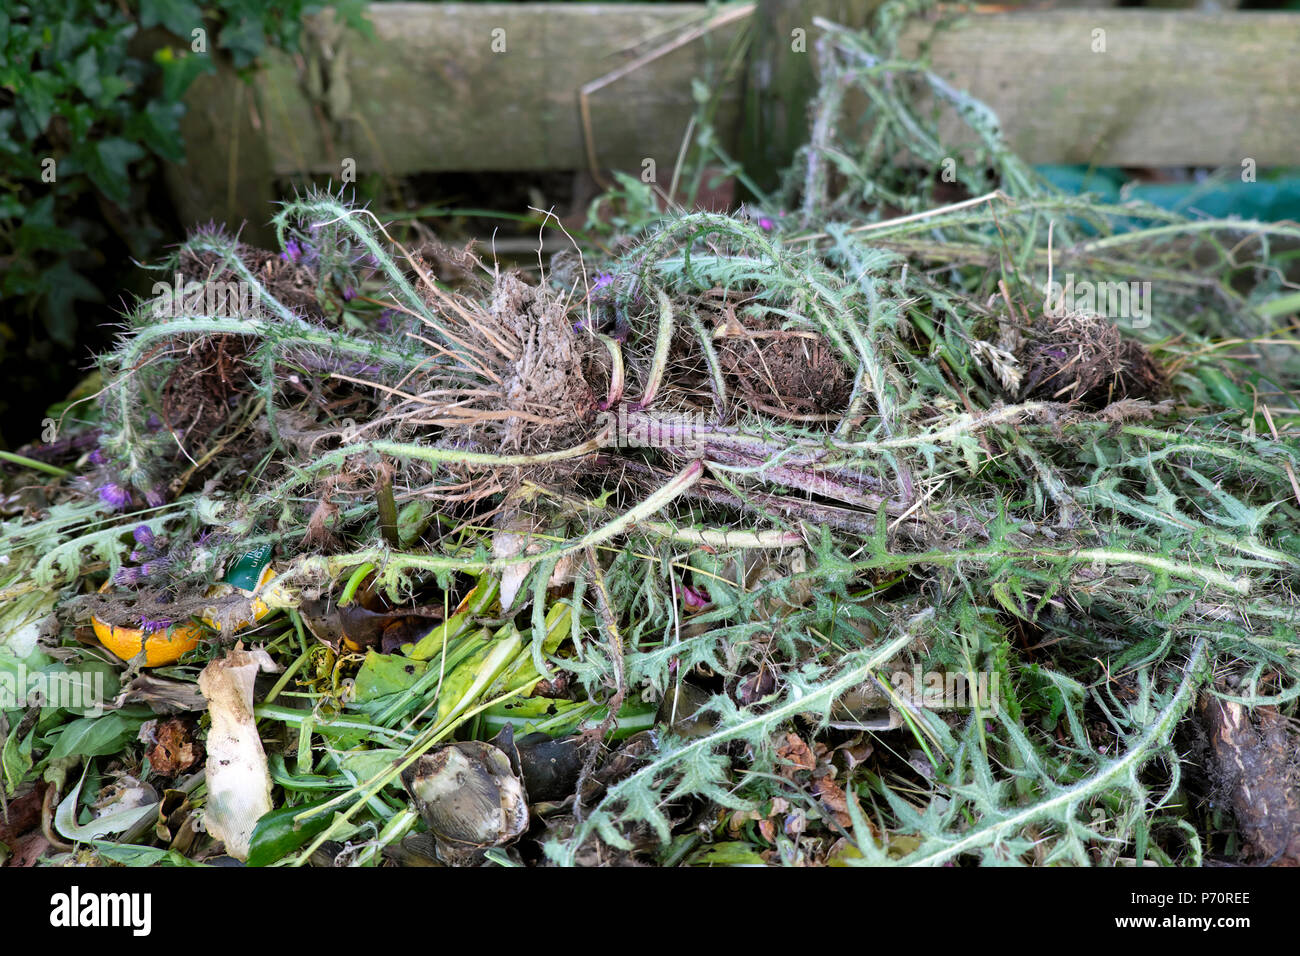 Dead Thistle Plants Garden Waste Chucked On A Food Compost Heap In Rural  Wales UK KATHY DEWITT